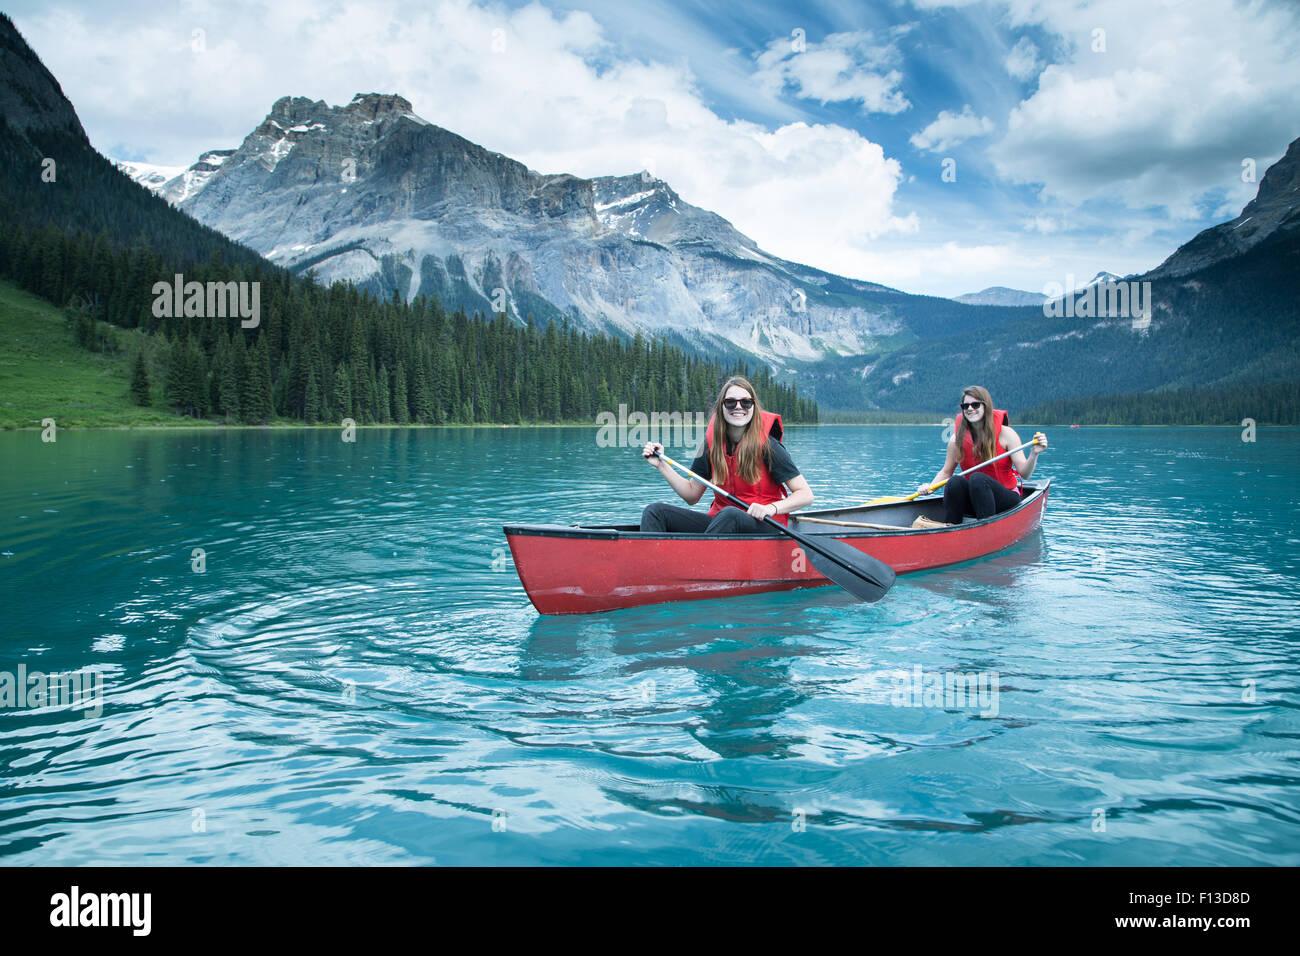 Zwei Mädchen, Kajak, Yoho Nationalpark, Britisch-Kolumbien, Kanada Stockbild